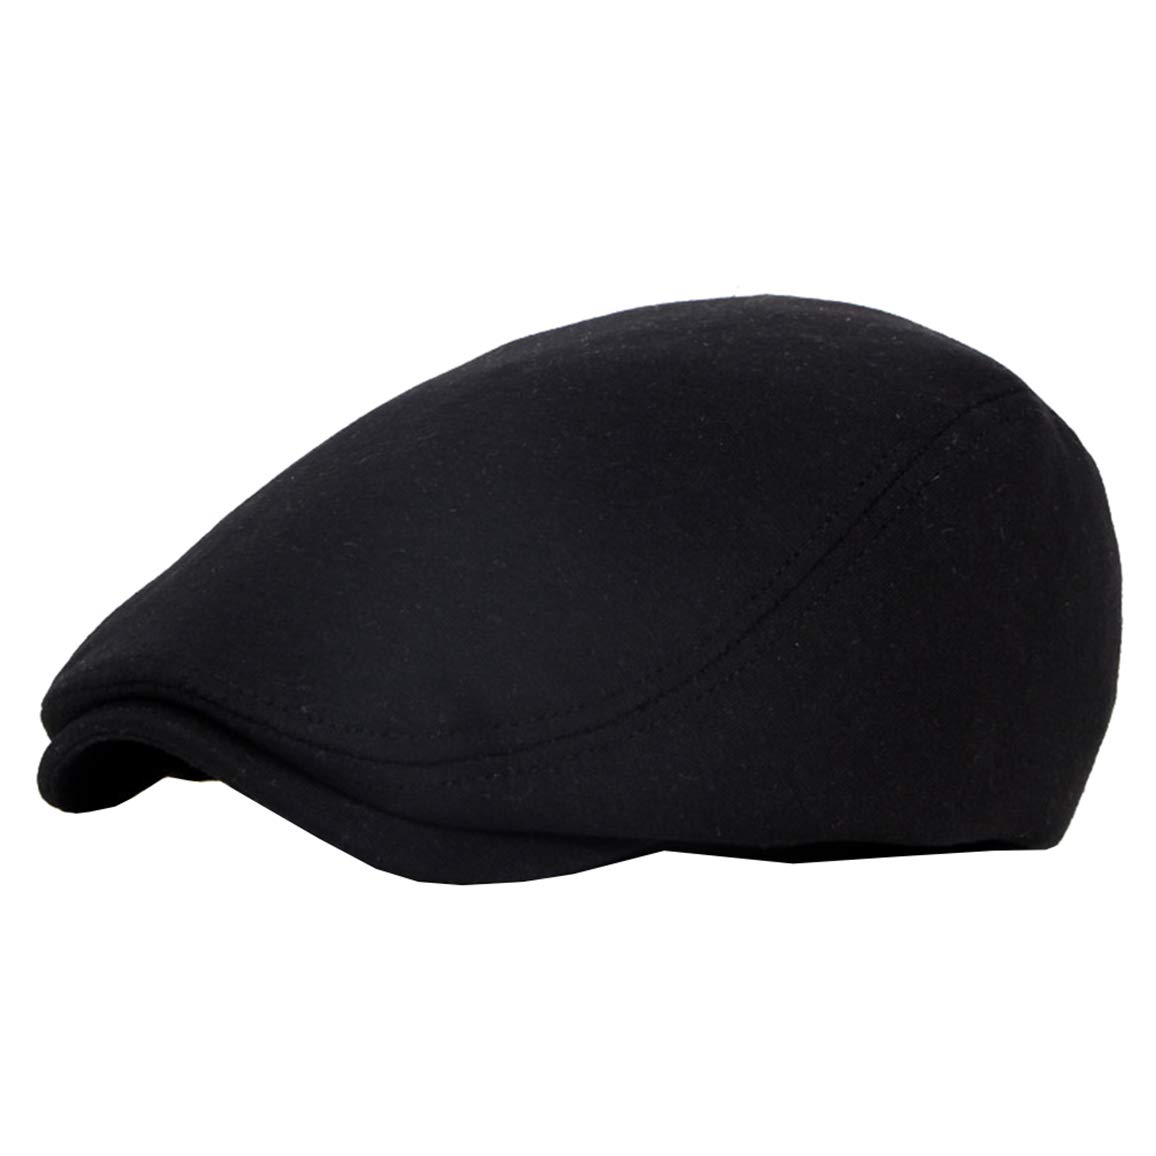 Beret-Hat-for-Men-French Newsboy-Flat-Gatsby-Cap Cotton-Adjustable Black -  Ivy Irish Hats Cabbie Driving at Amazon Men s Clothing store  f362037e8dc3